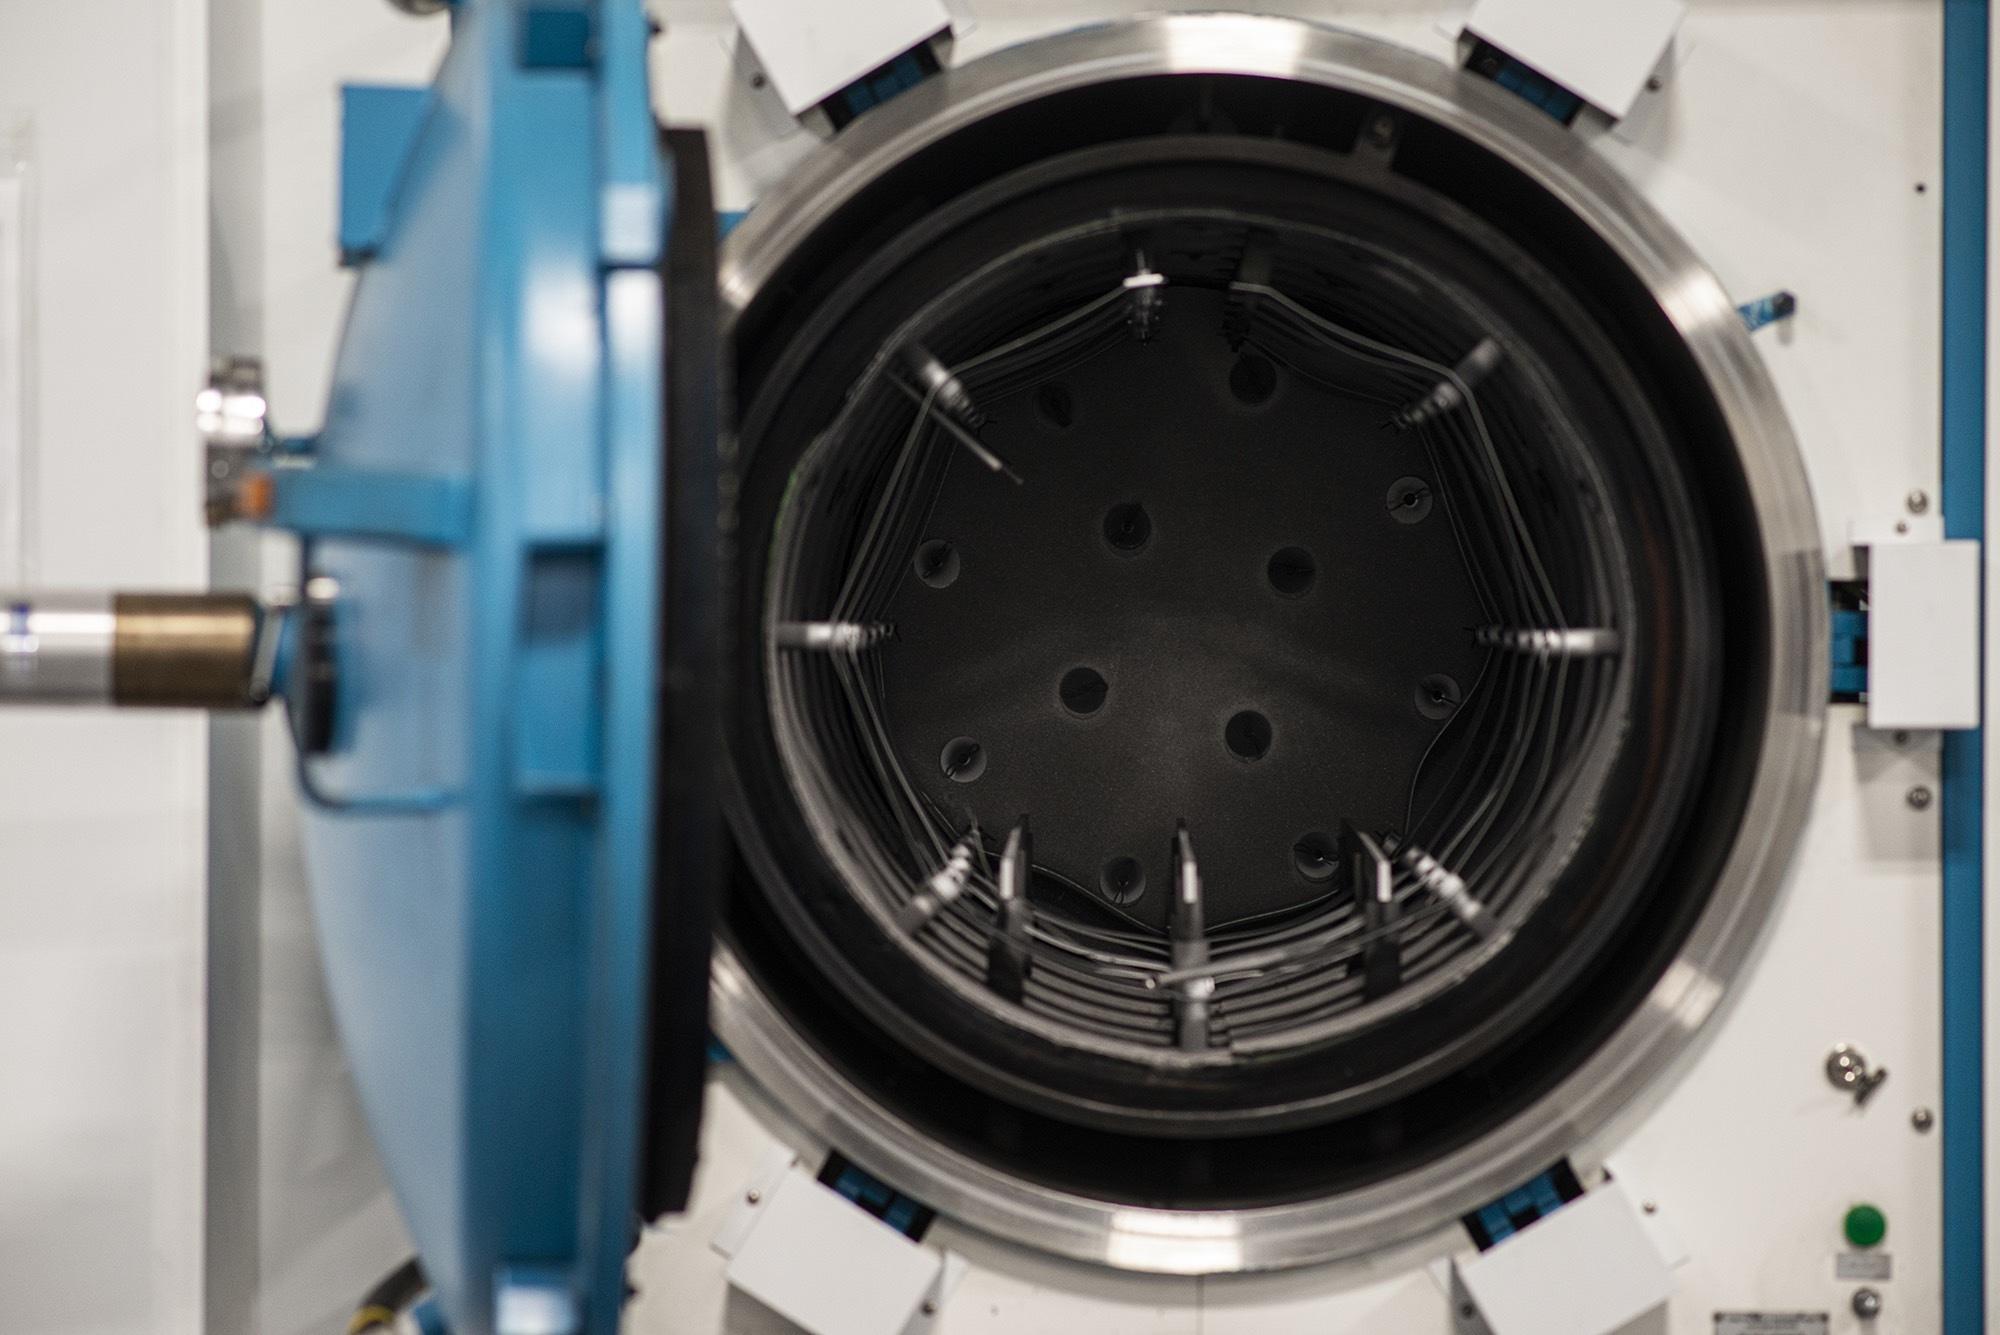 Interior of Vacu Braze machinery